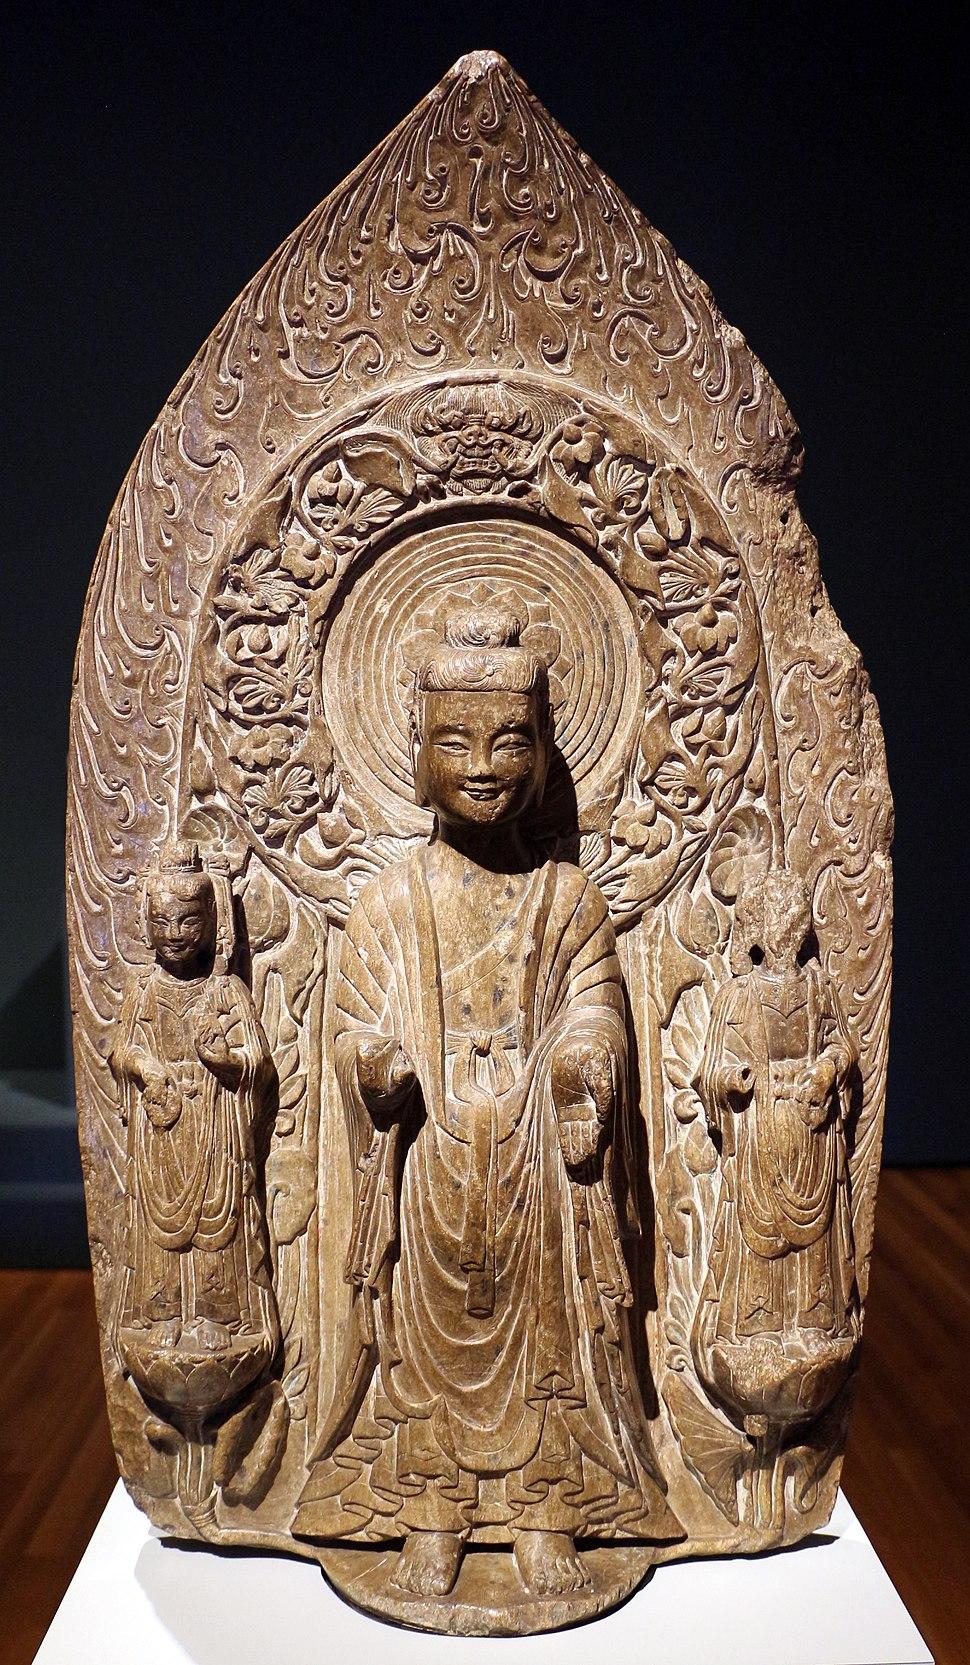 Dinastia wei orientale, stele con shakyamuni e i bodhisattva, dall%27hebei, 537, 01